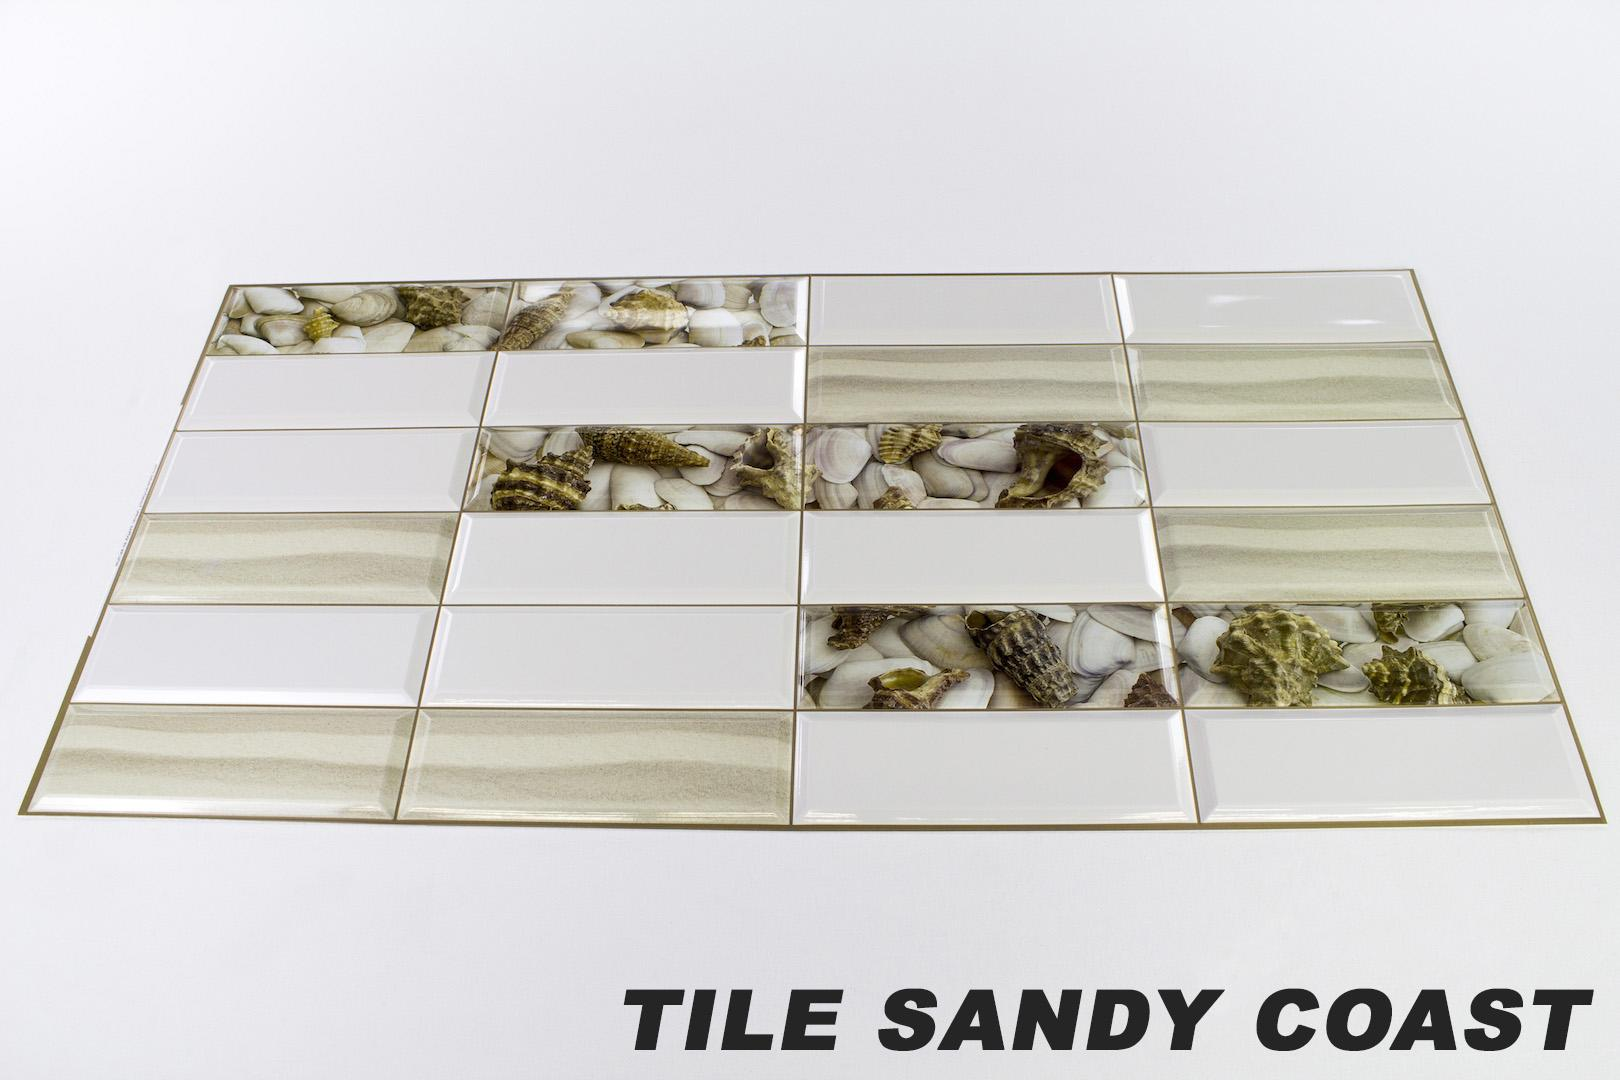 1 pvc dekorplatte mosaic wandverkleidung platten 95x48cm tile sandy coast ebay. Black Bedroom Furniture Sets. Home Design Ideas